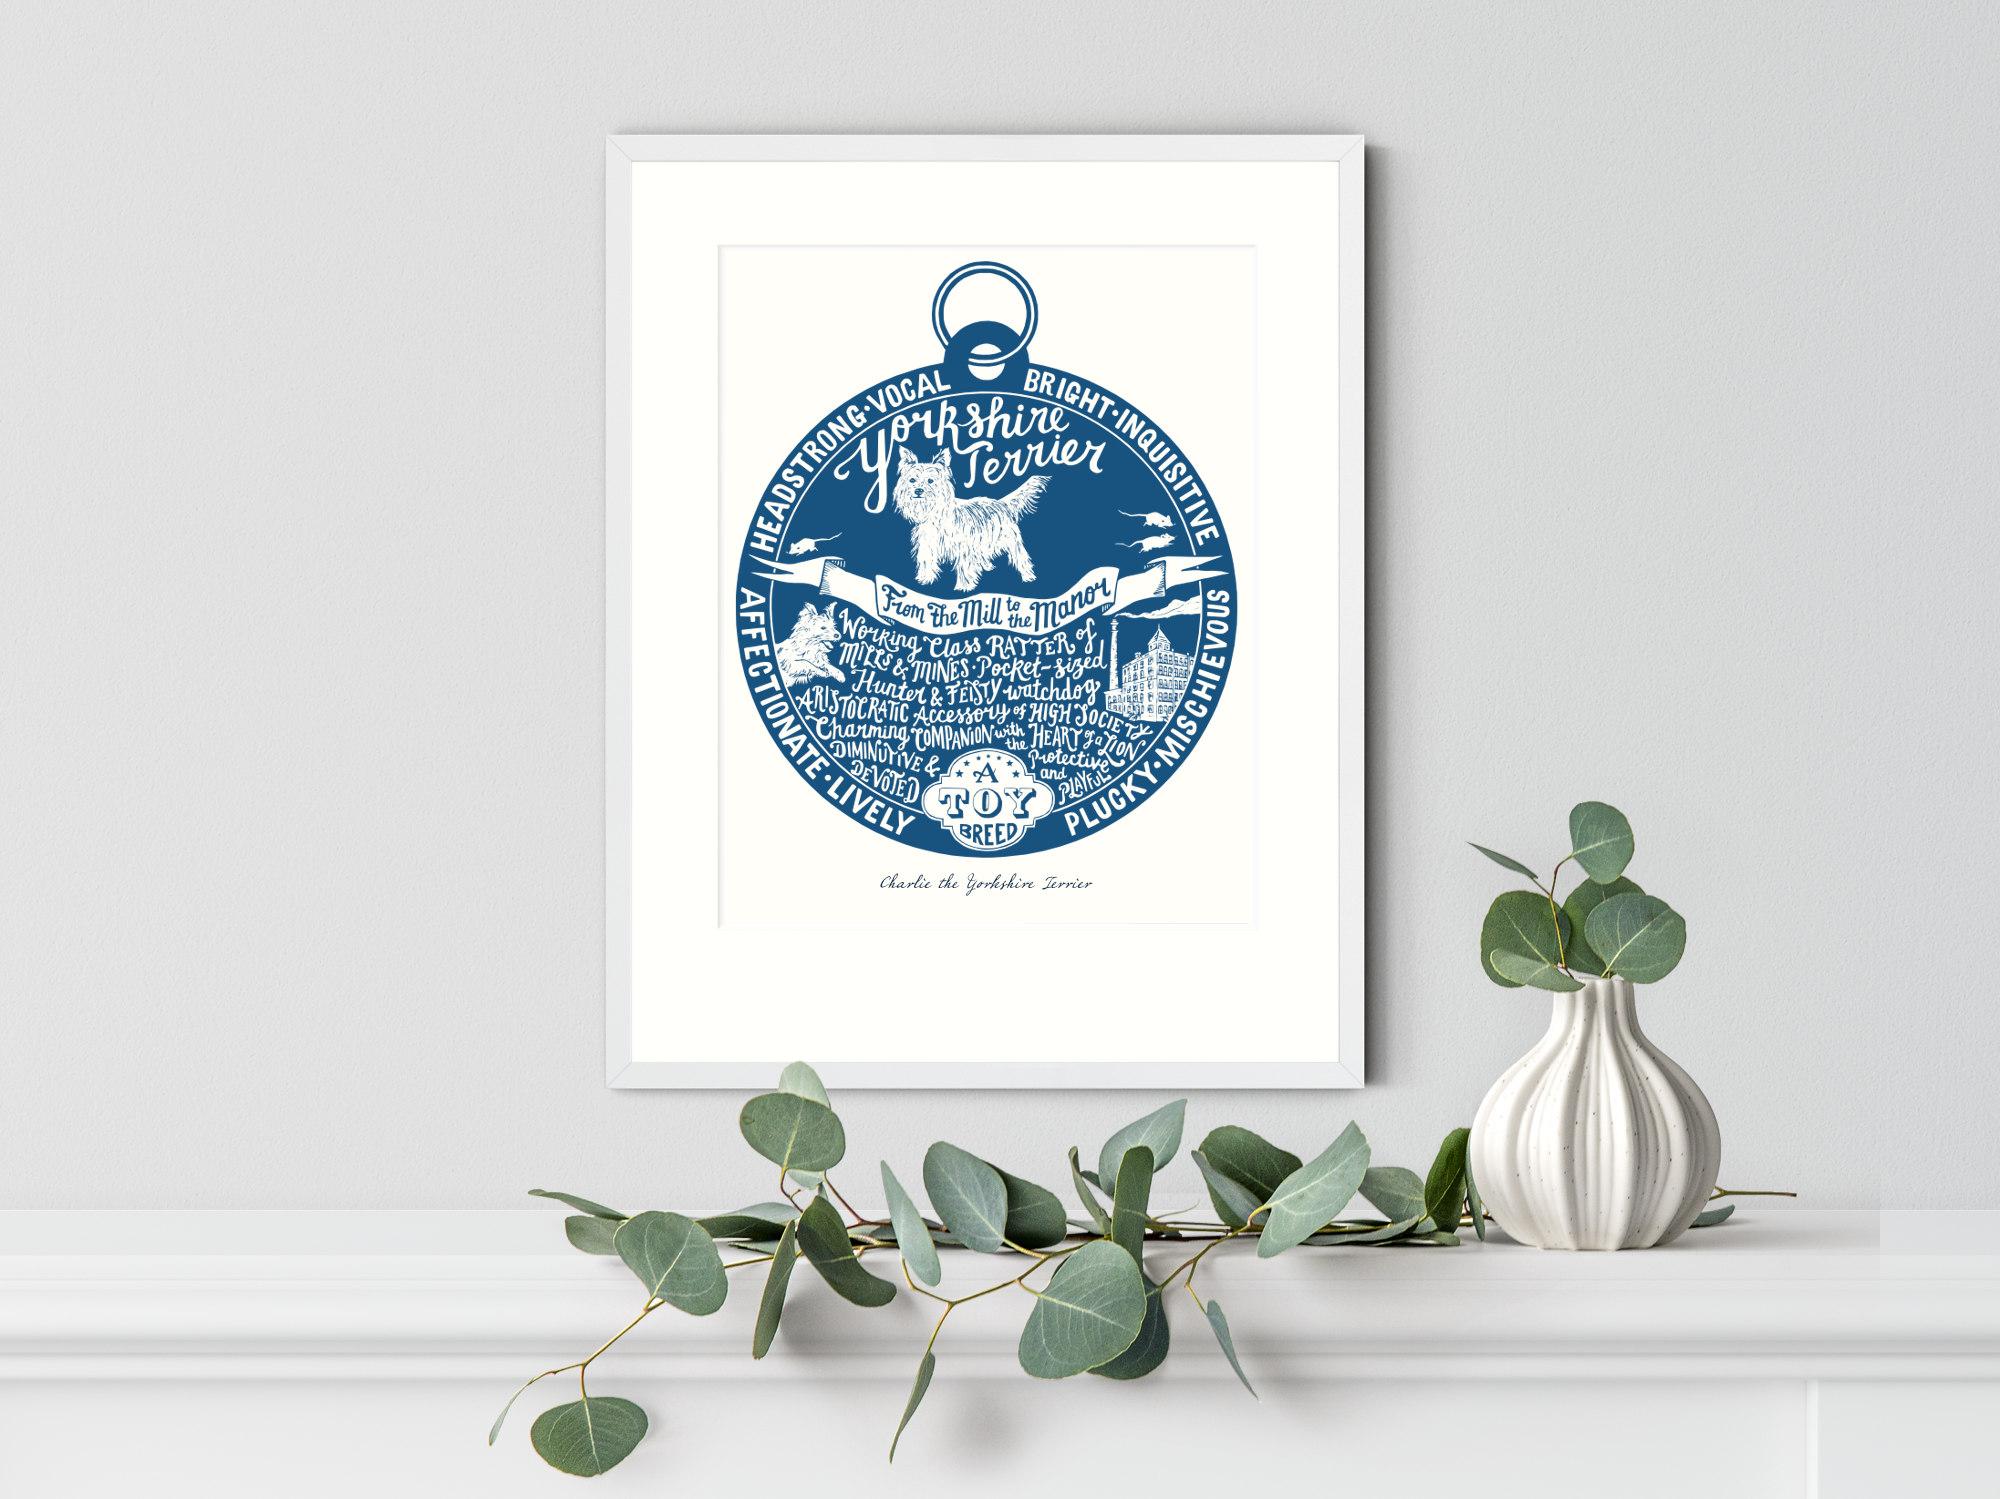 Yorkshire Terrier Art Print | The Enlightened Hound